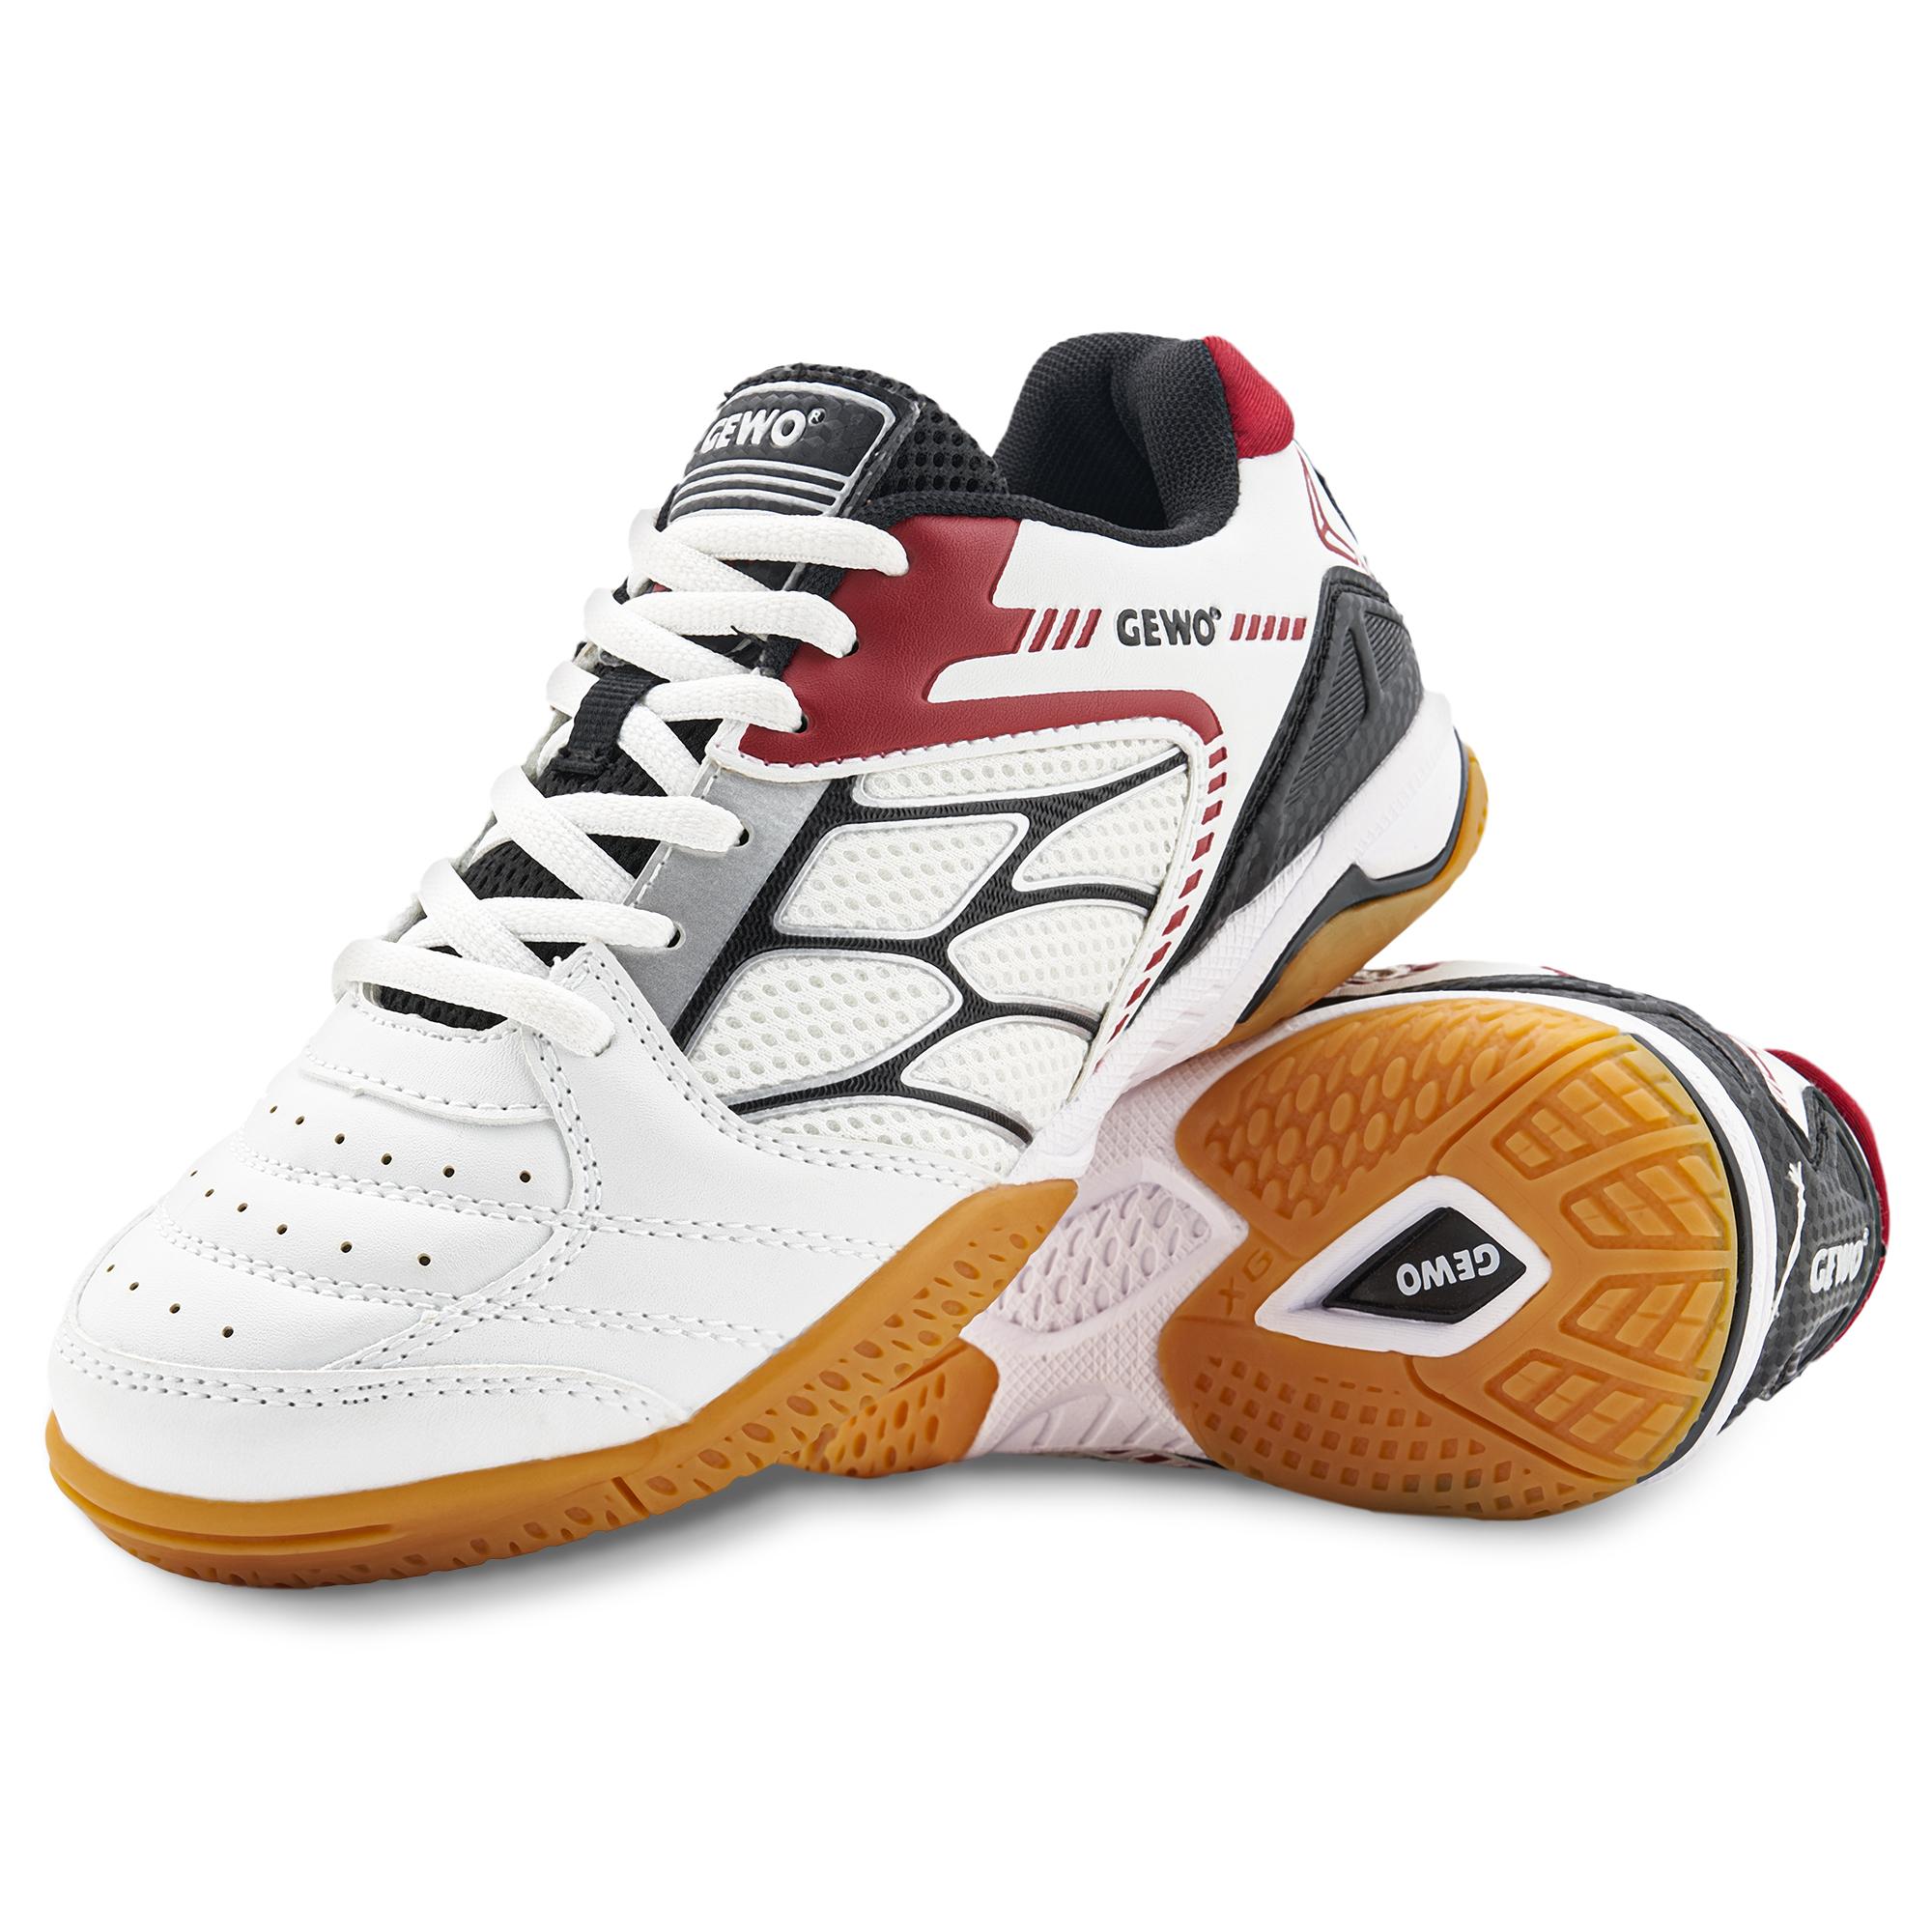 Table Tennis Footwear: Gewo Shoe Smash